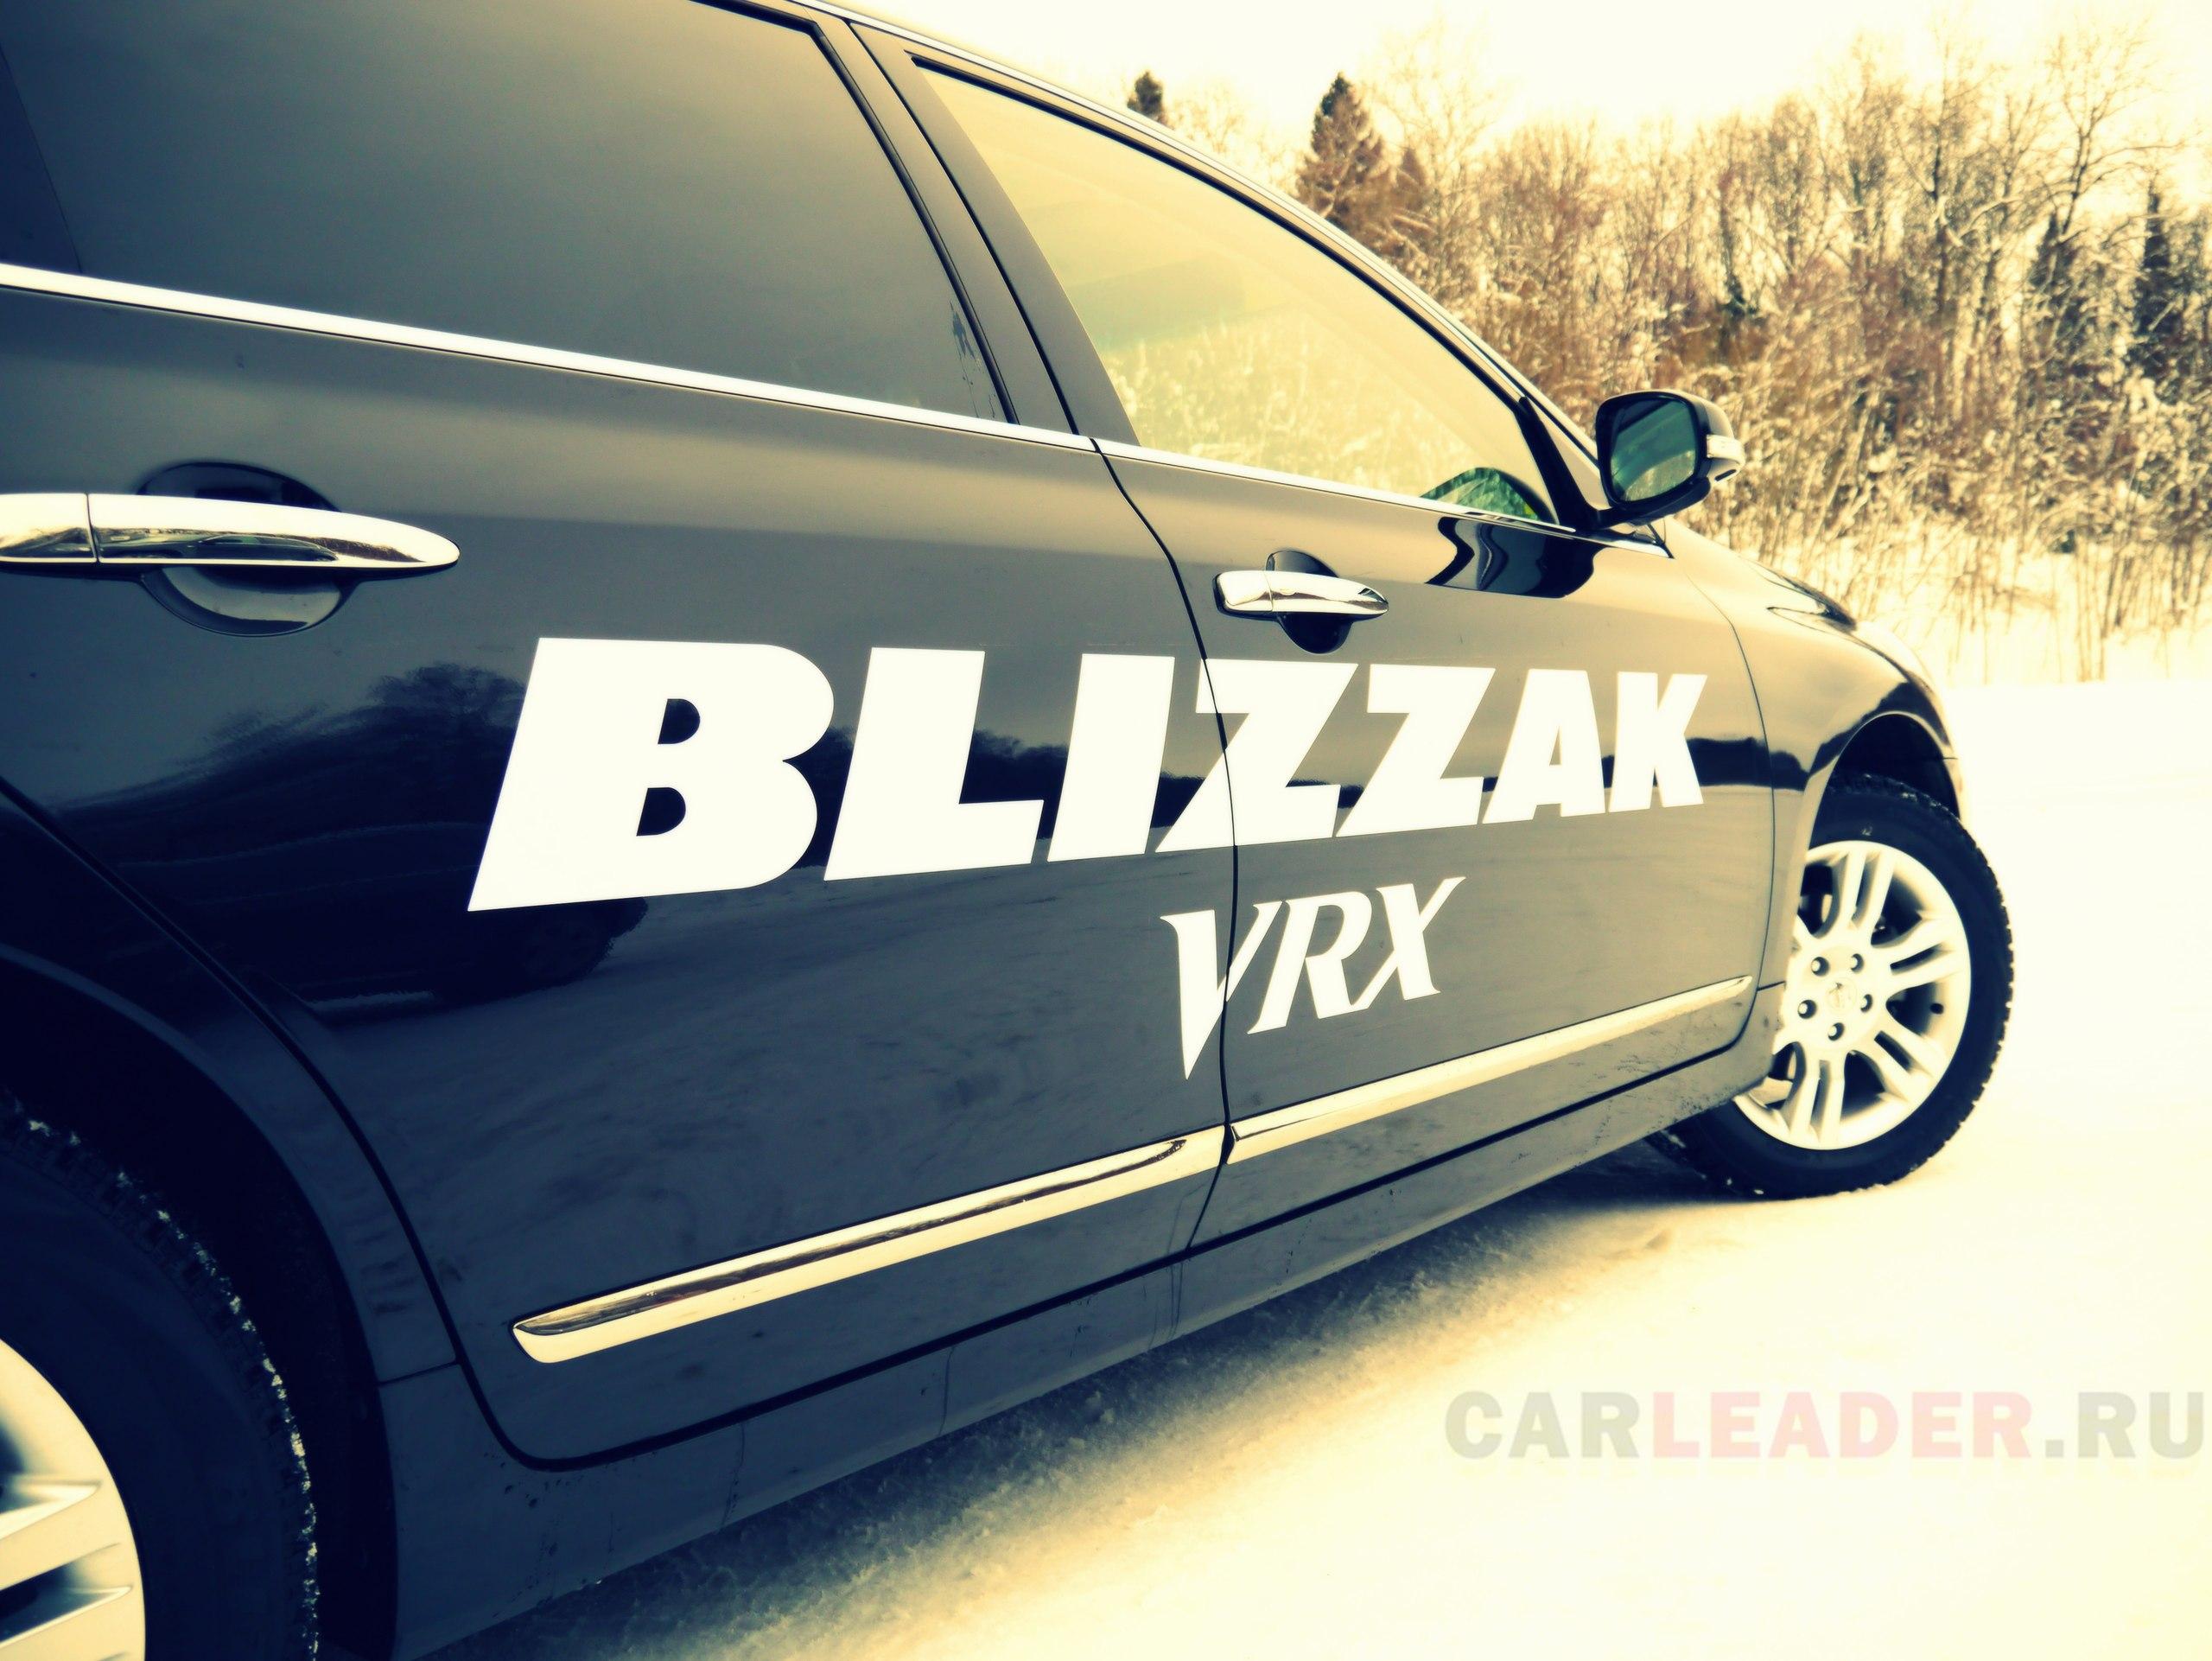 Blizzak VRX @ Nissan Teana